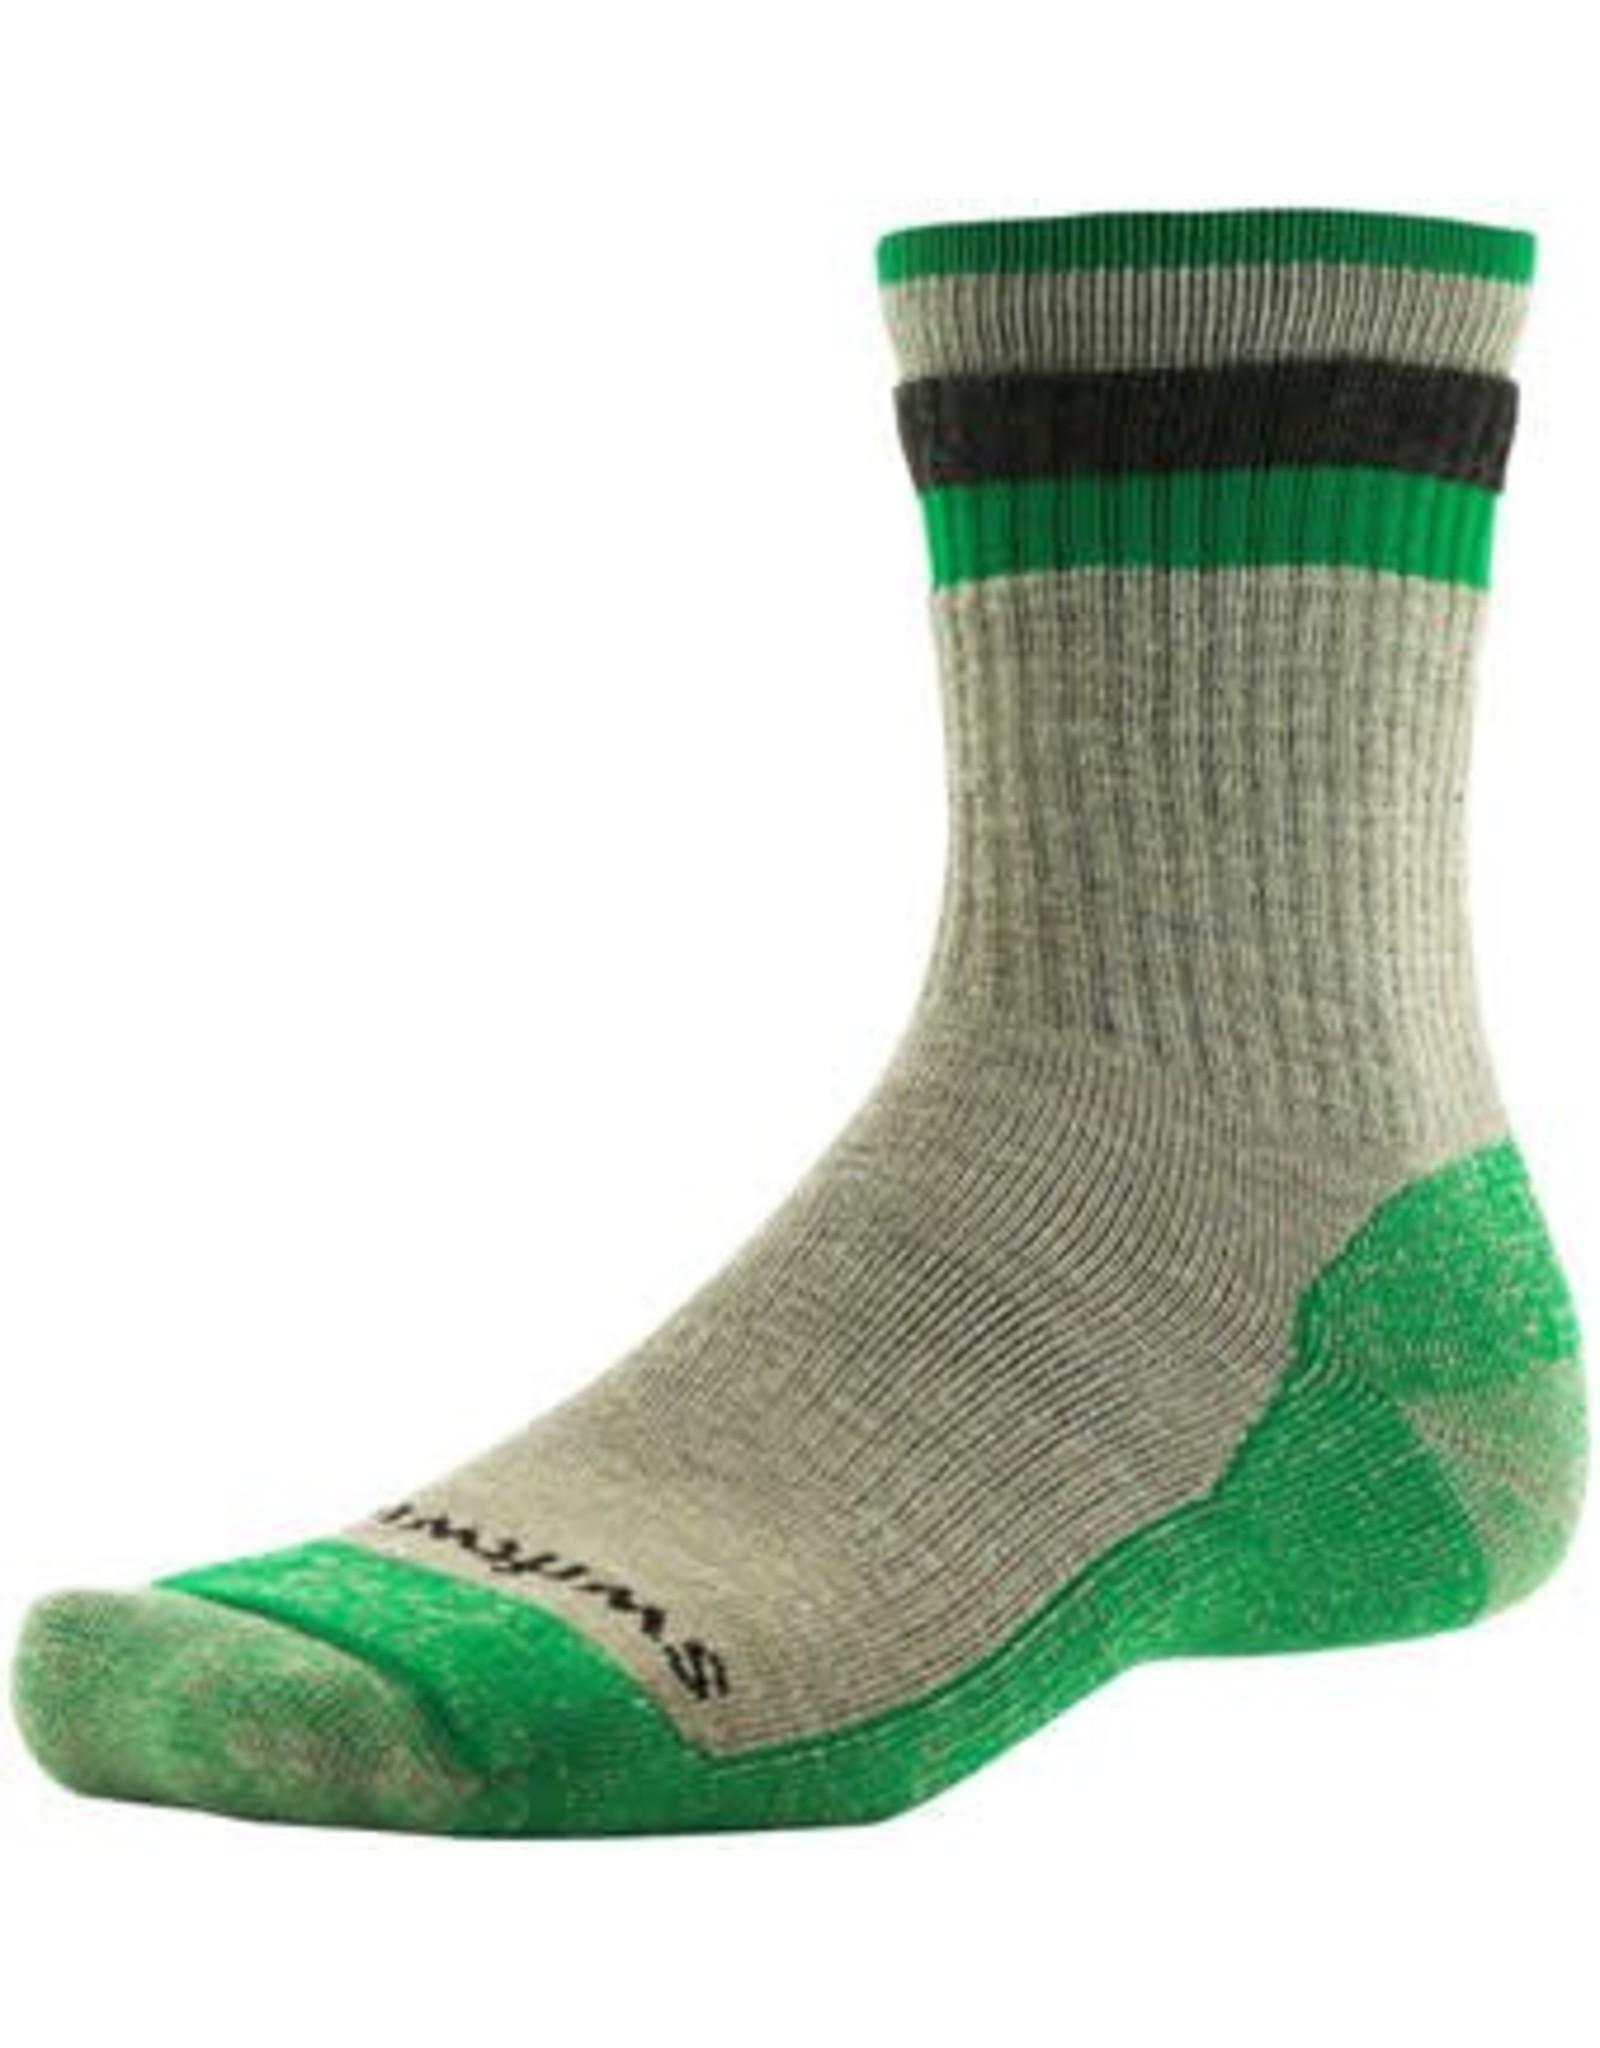 Swiftwick Pursuit Hike Six Medium Cushion Wool Socks